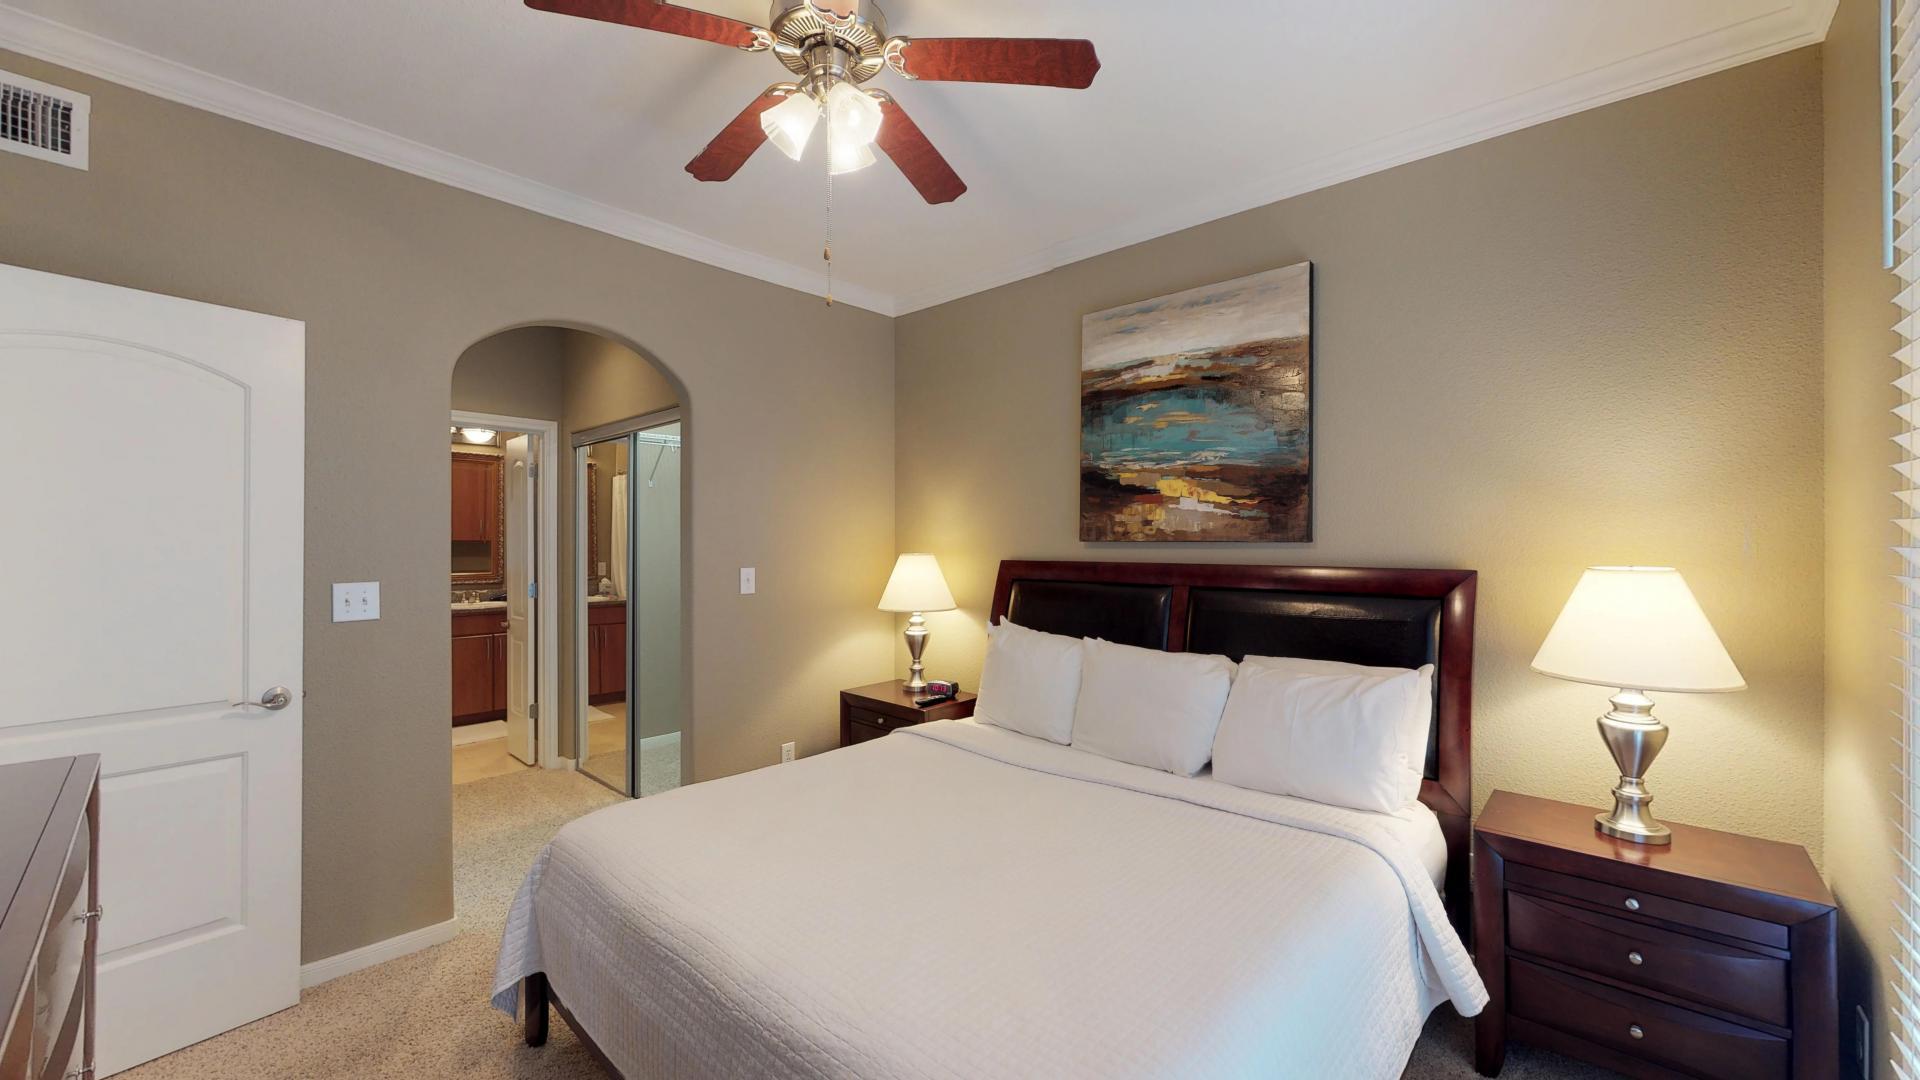 Bedroom at San Paloma Corporate Housing